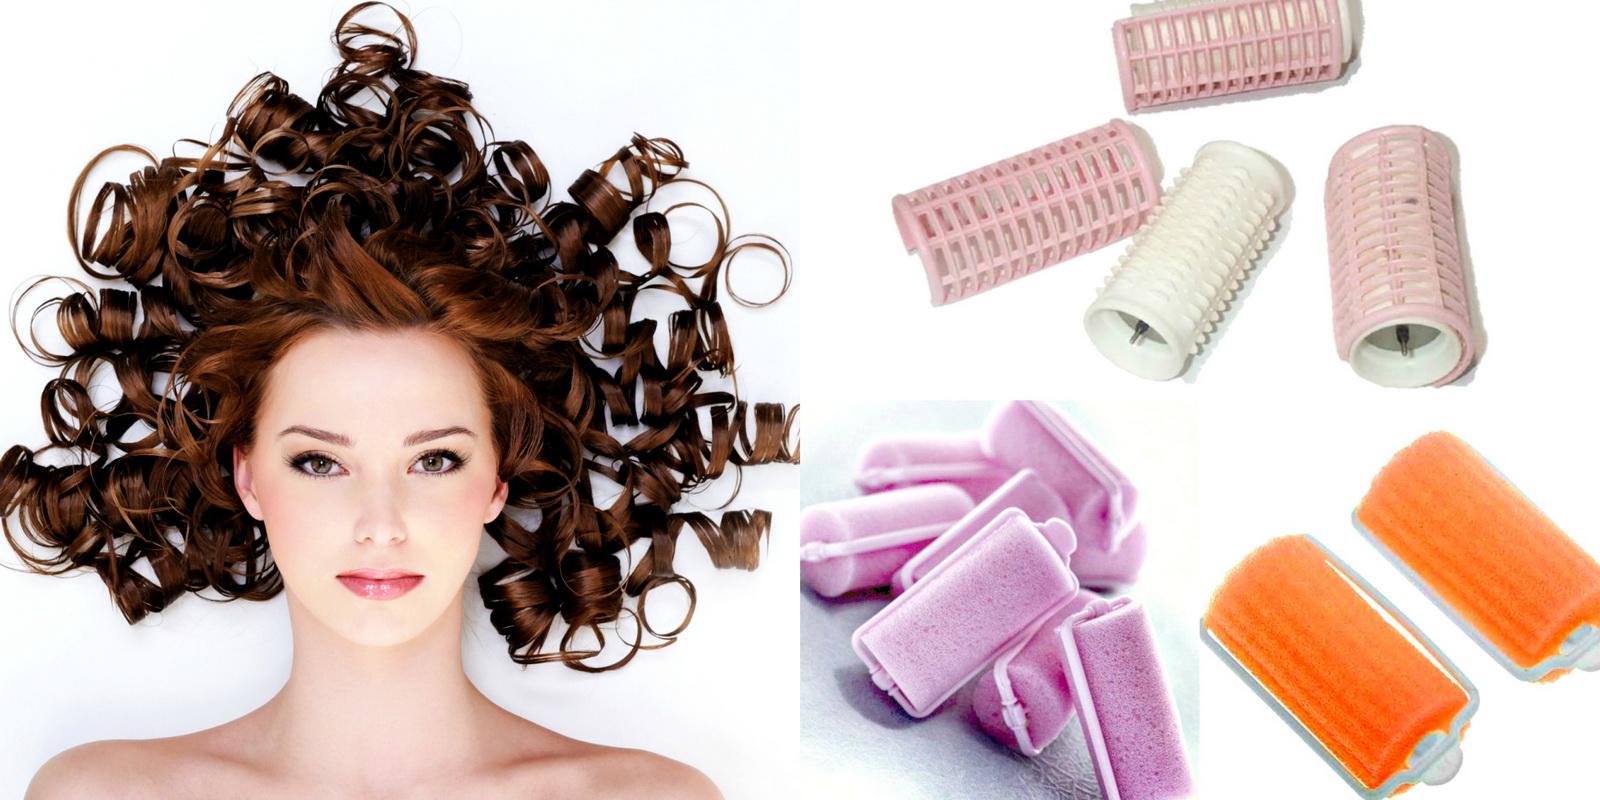 Укладка волос на бигуди пошагово фото